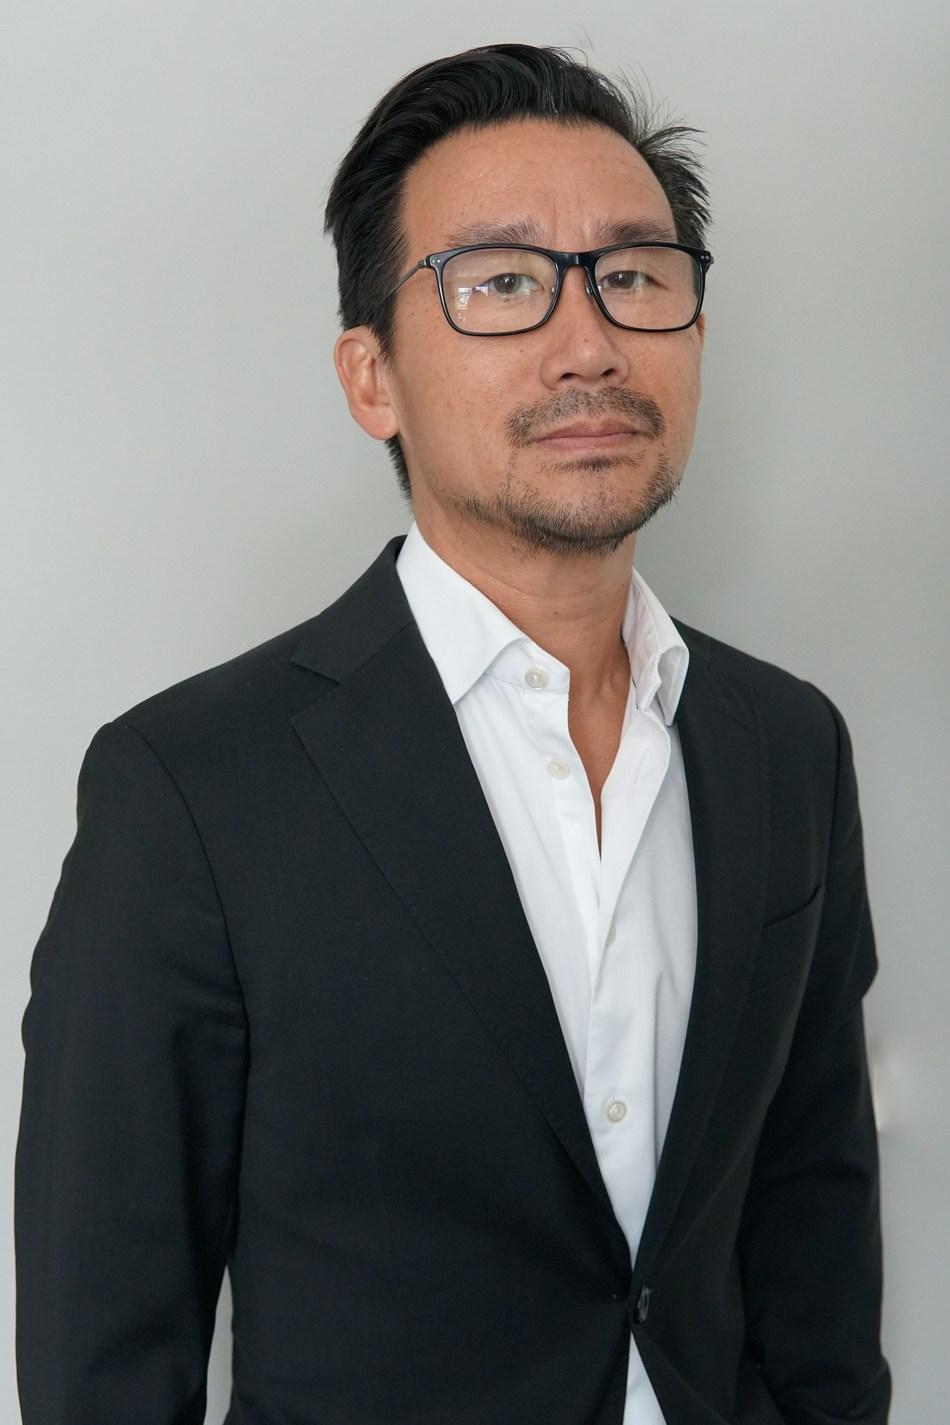 Daniel Österberg-Holm, vice president, alliances, channels, and specialist sales, EMEA, Pegasystems